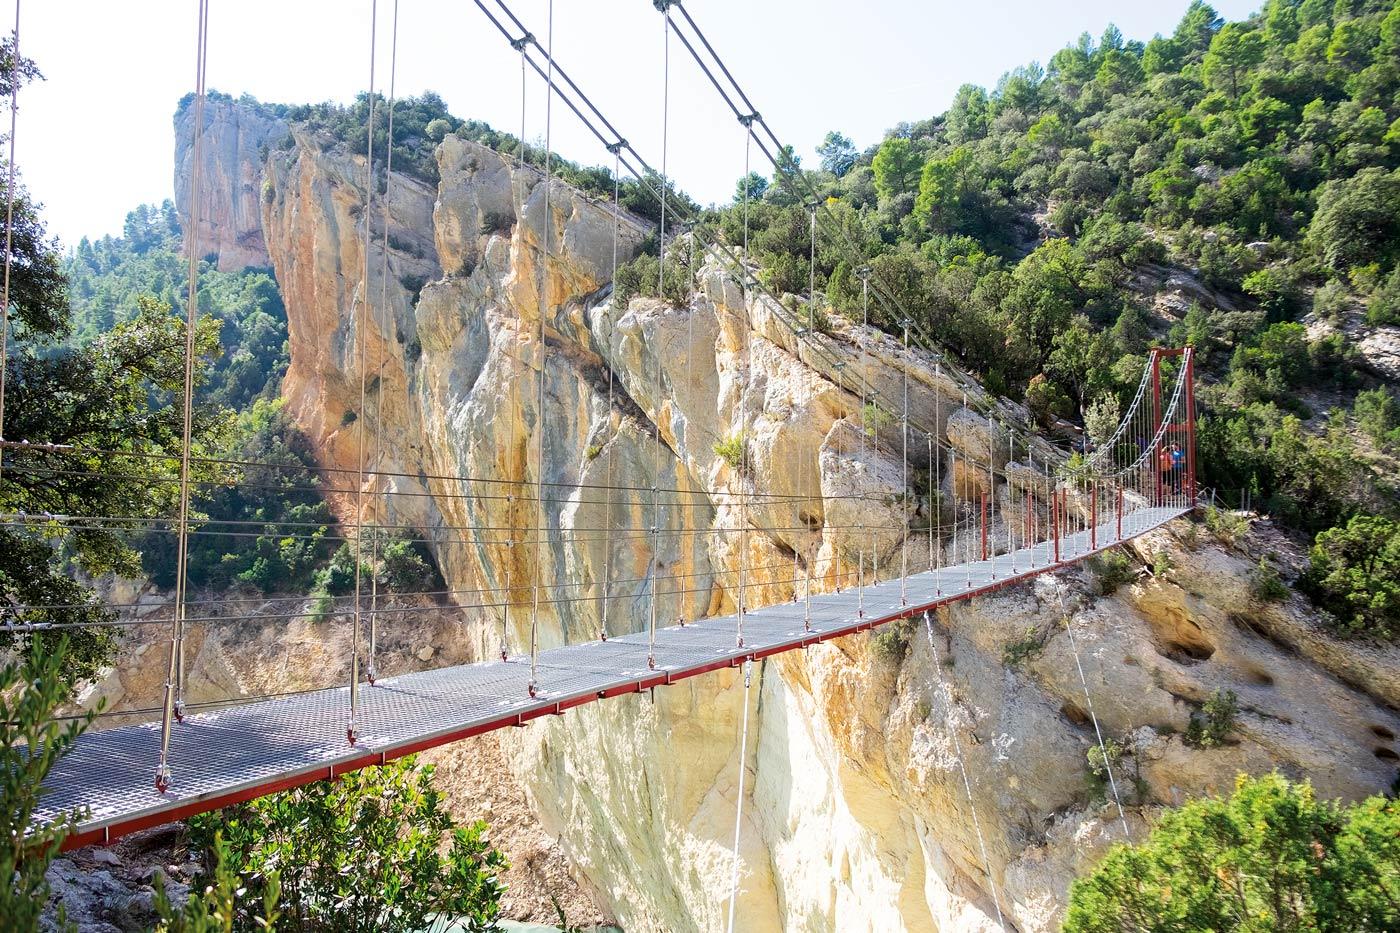 hängebrücke, Wanderlust, Natur, Schluchtenwanderung, Wandern im Congost de Montrebei